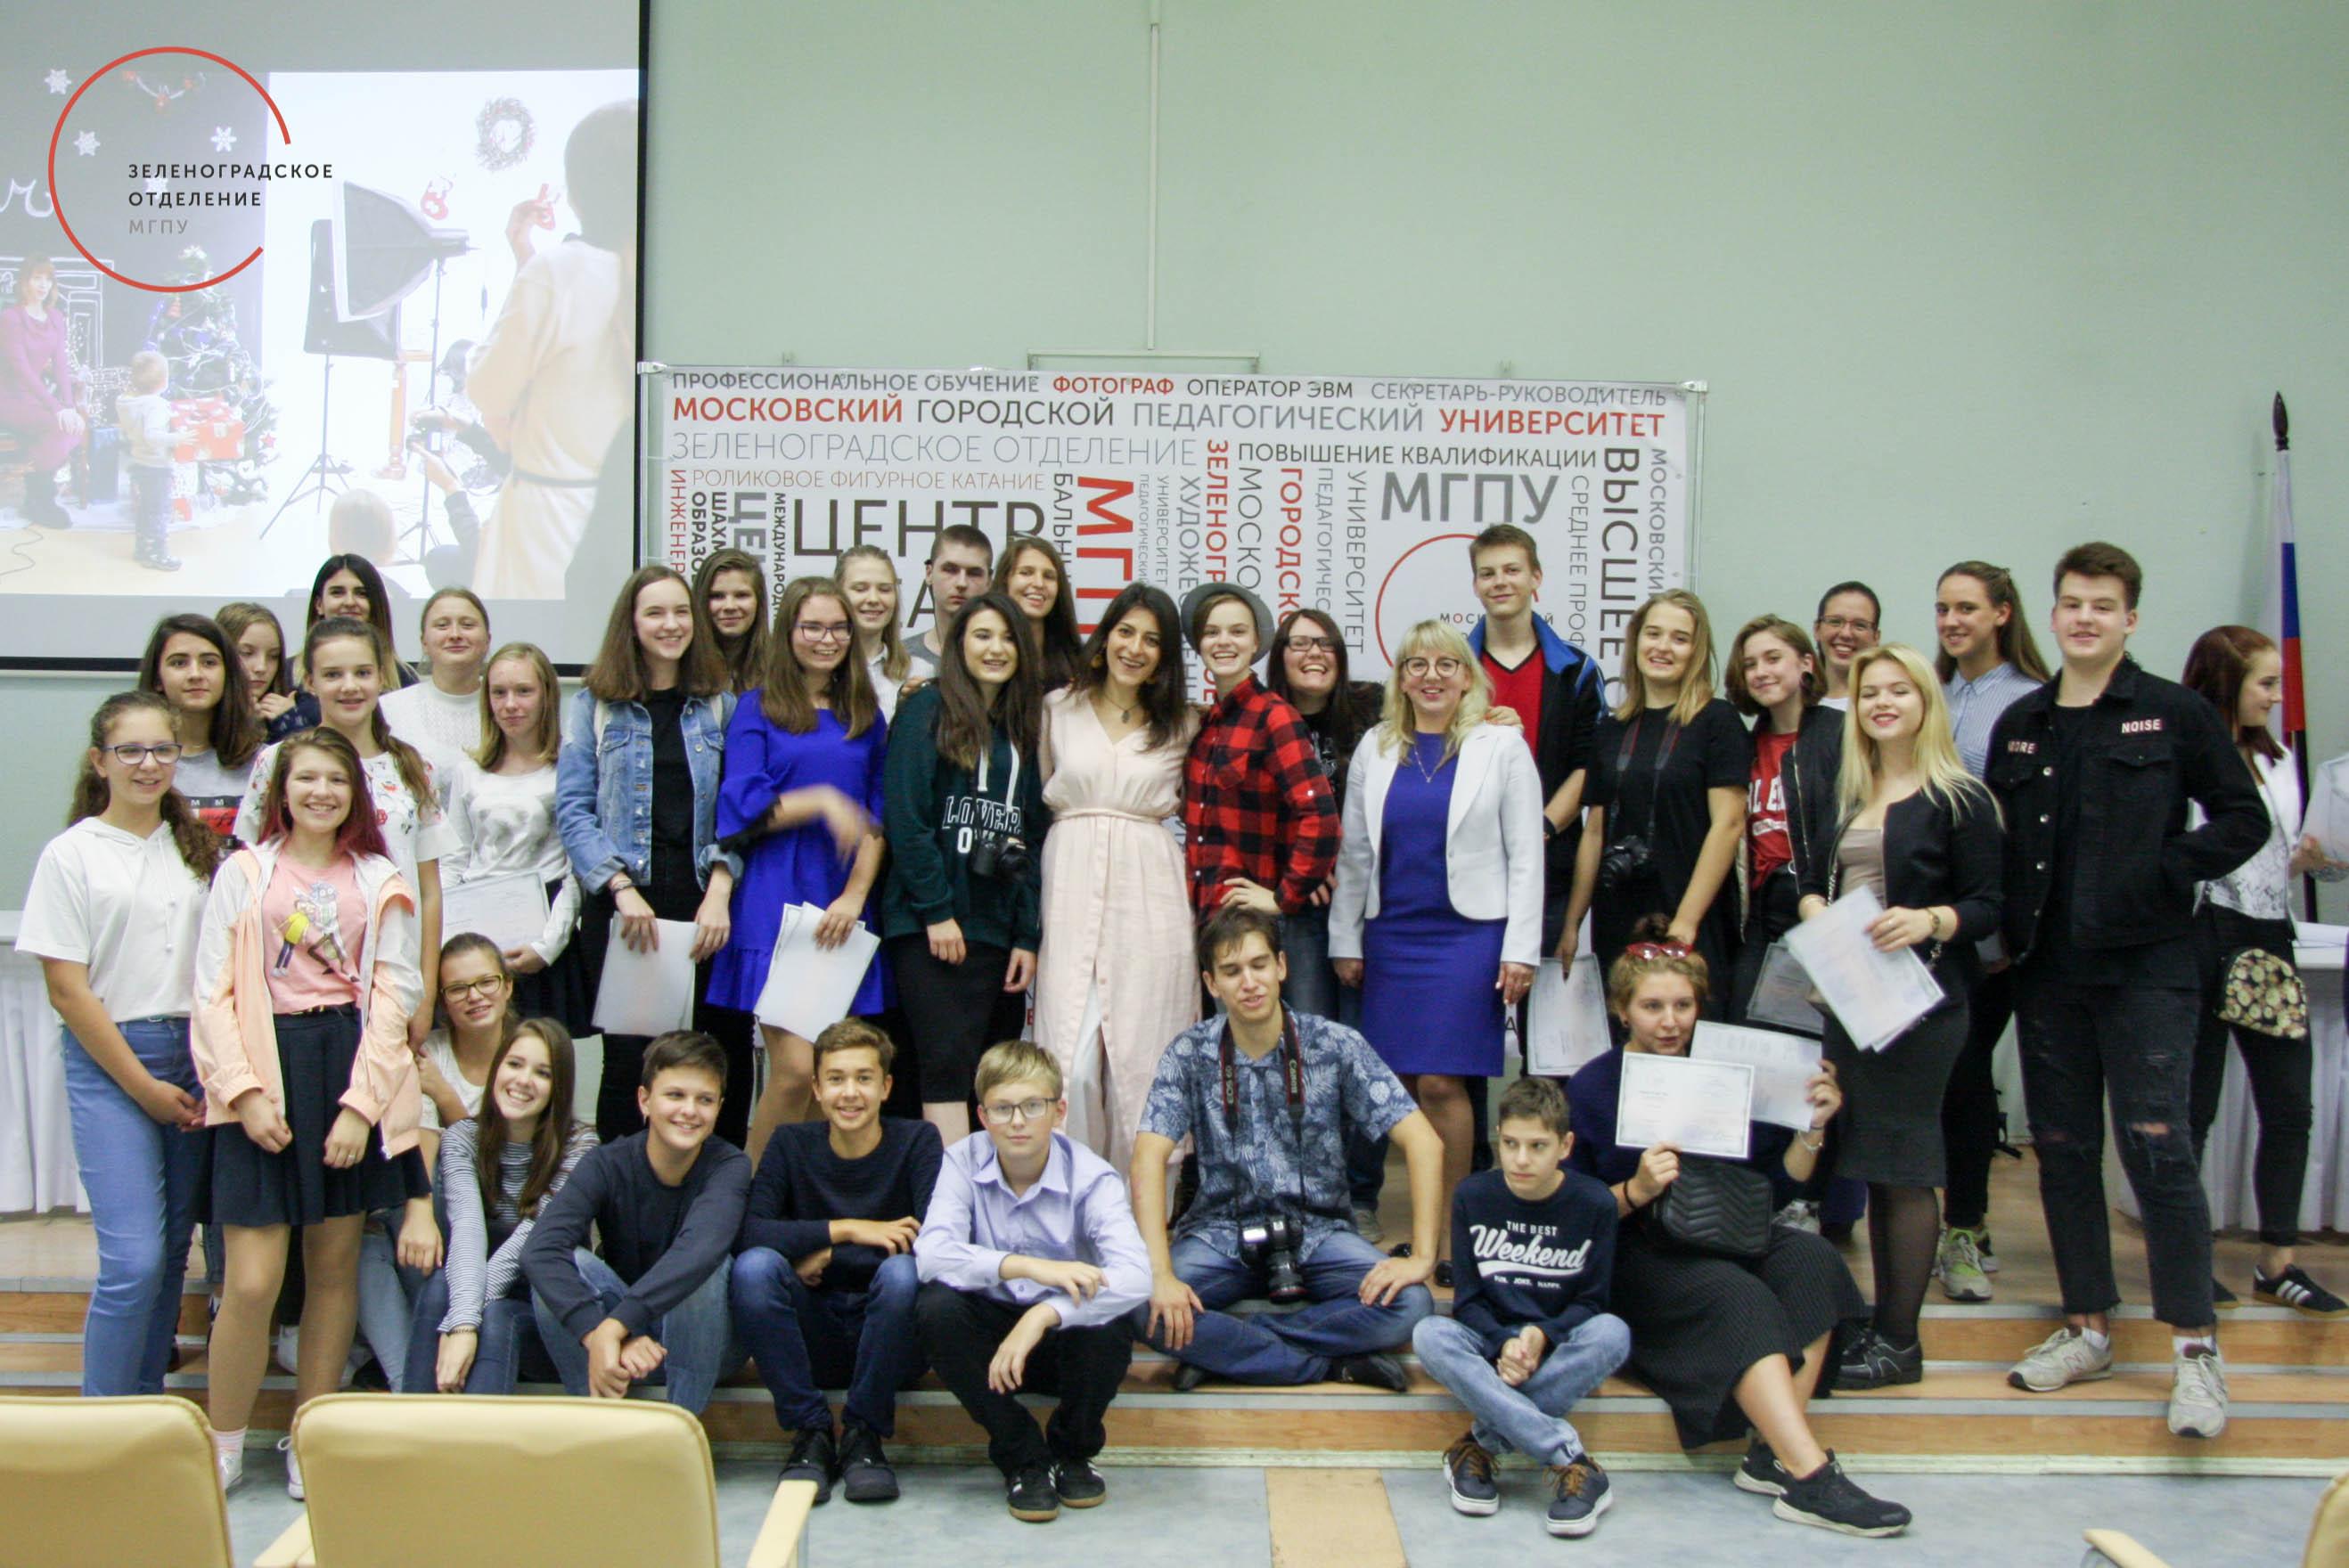 Зеленоградский фестиваль фотографий